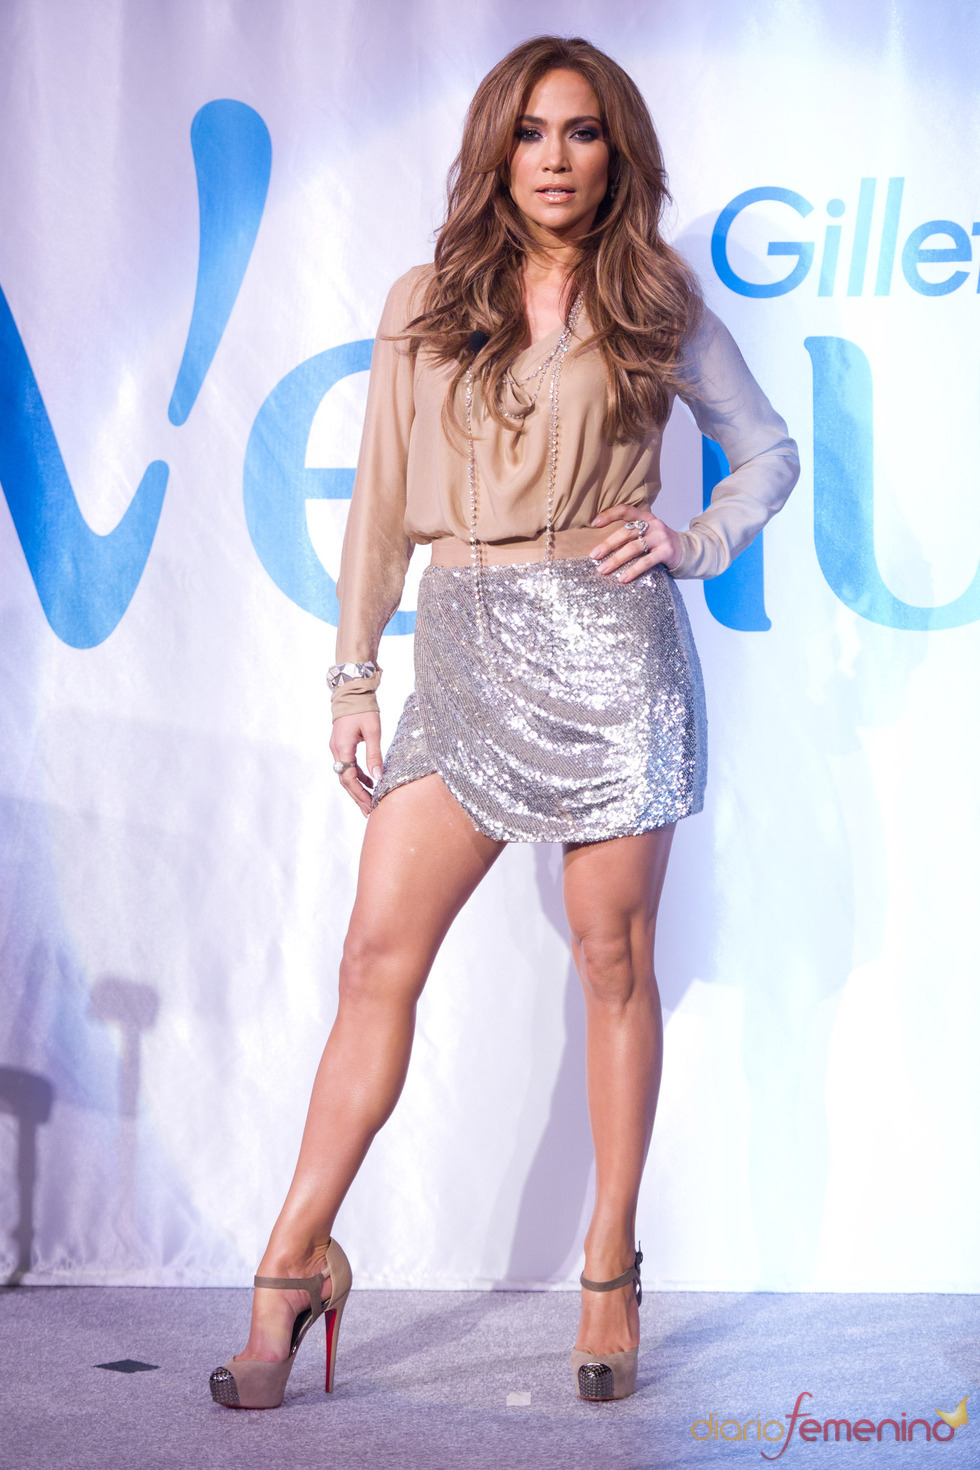 Jennifer López, radiante como imagen de Gillette Venus